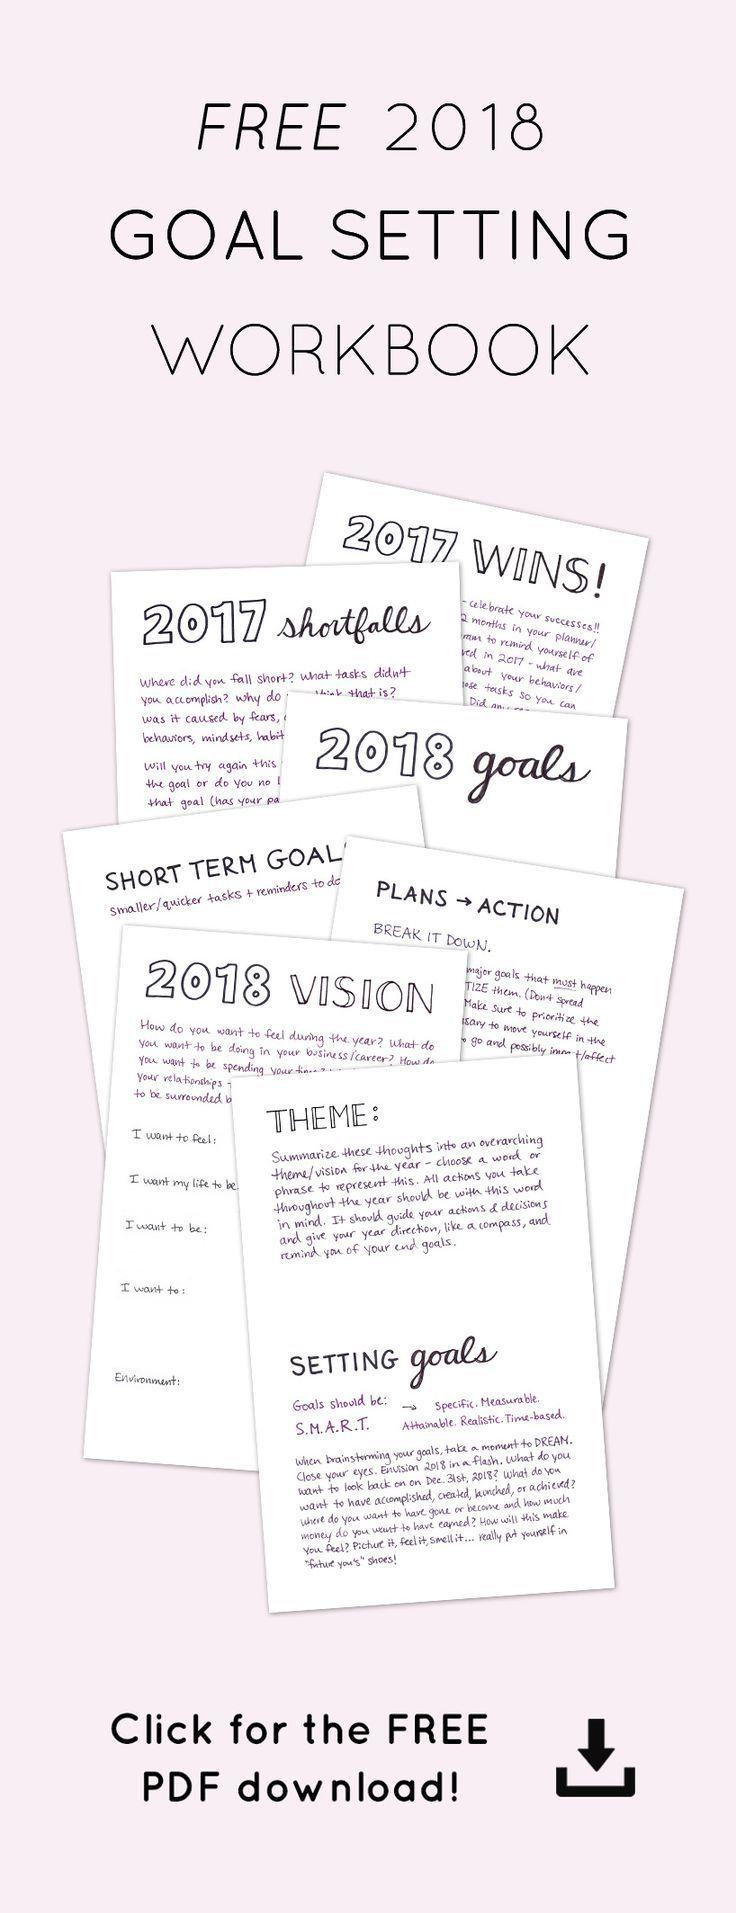 2019 Goal Setting Workbook Lin Pernille Photography Goals Worksheet Smart Goals Worksheet Workbook